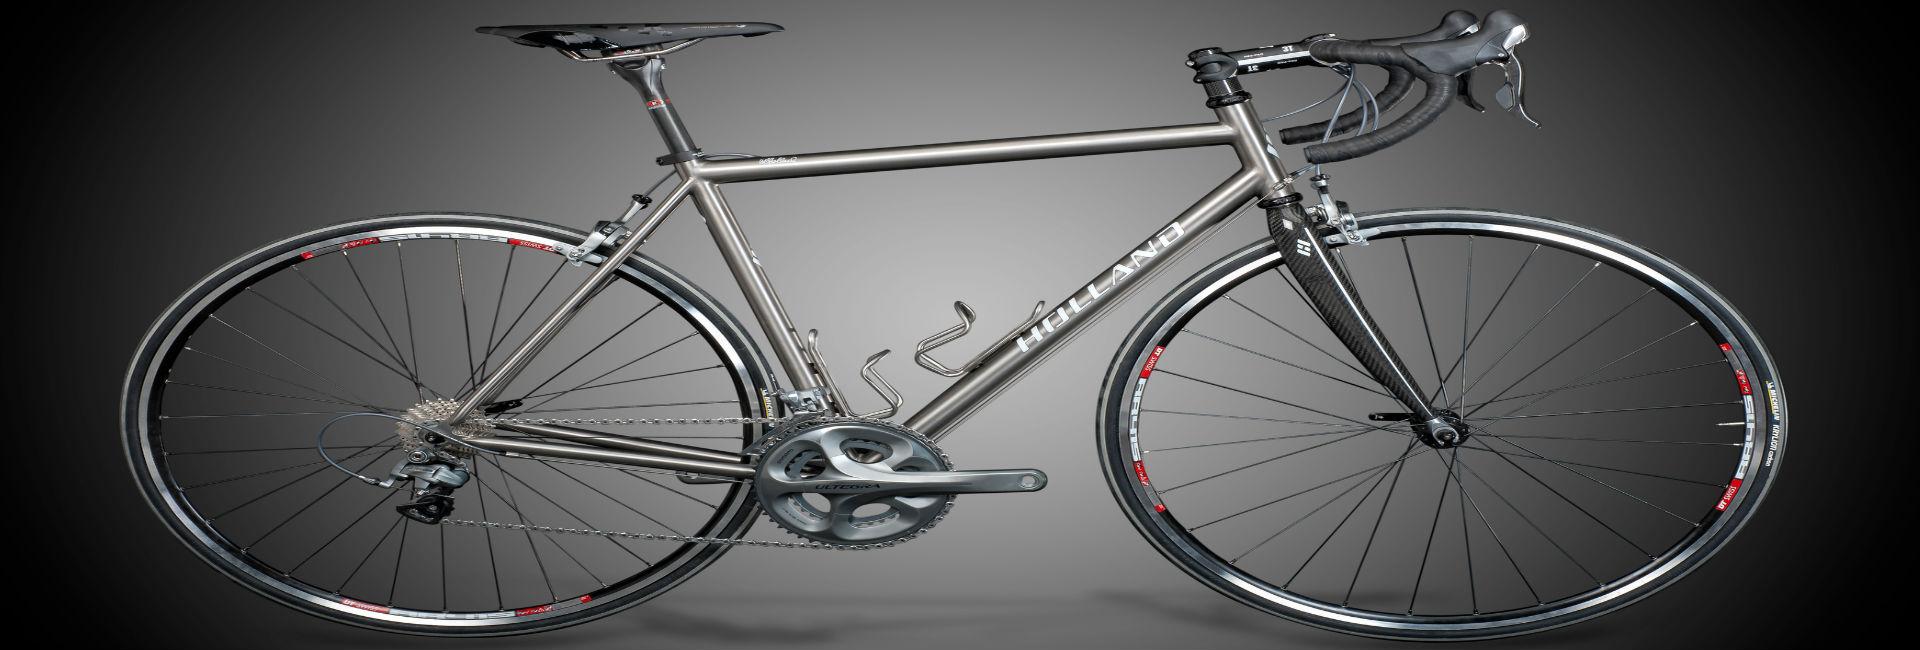 titanium-bike1